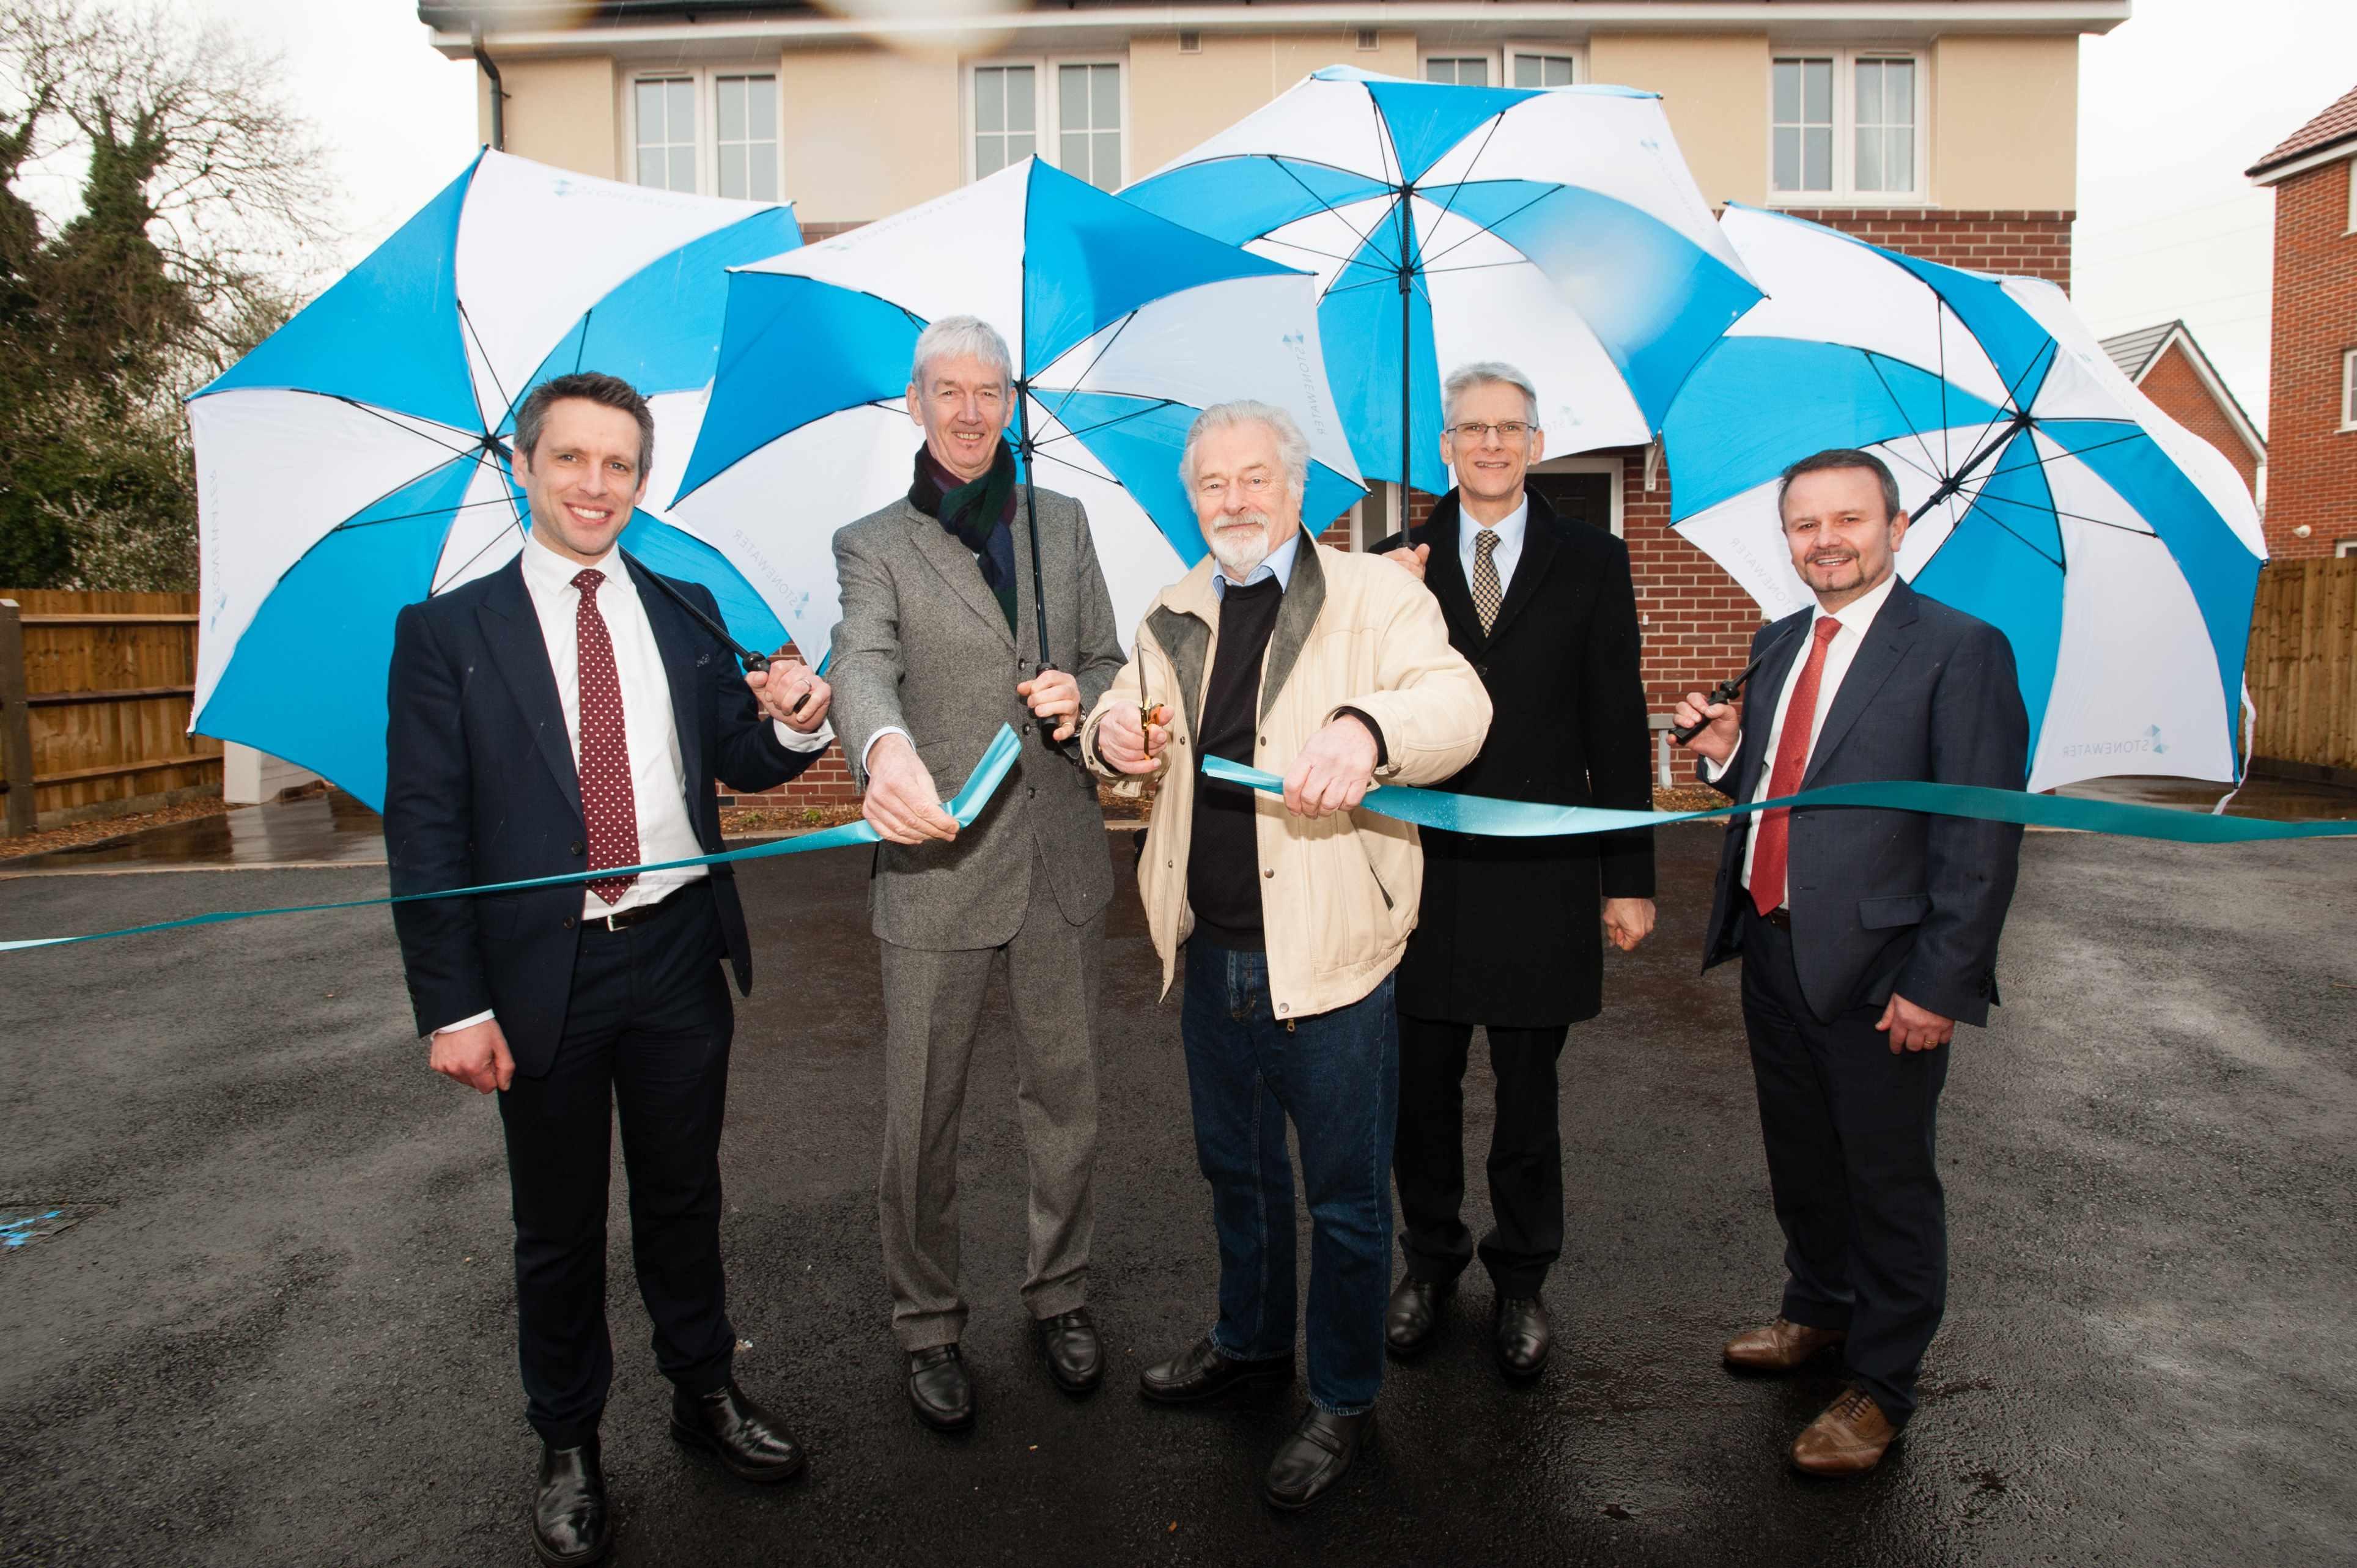 Stonewater's new development helps bridge the affordability gap in Weston-super-Mare